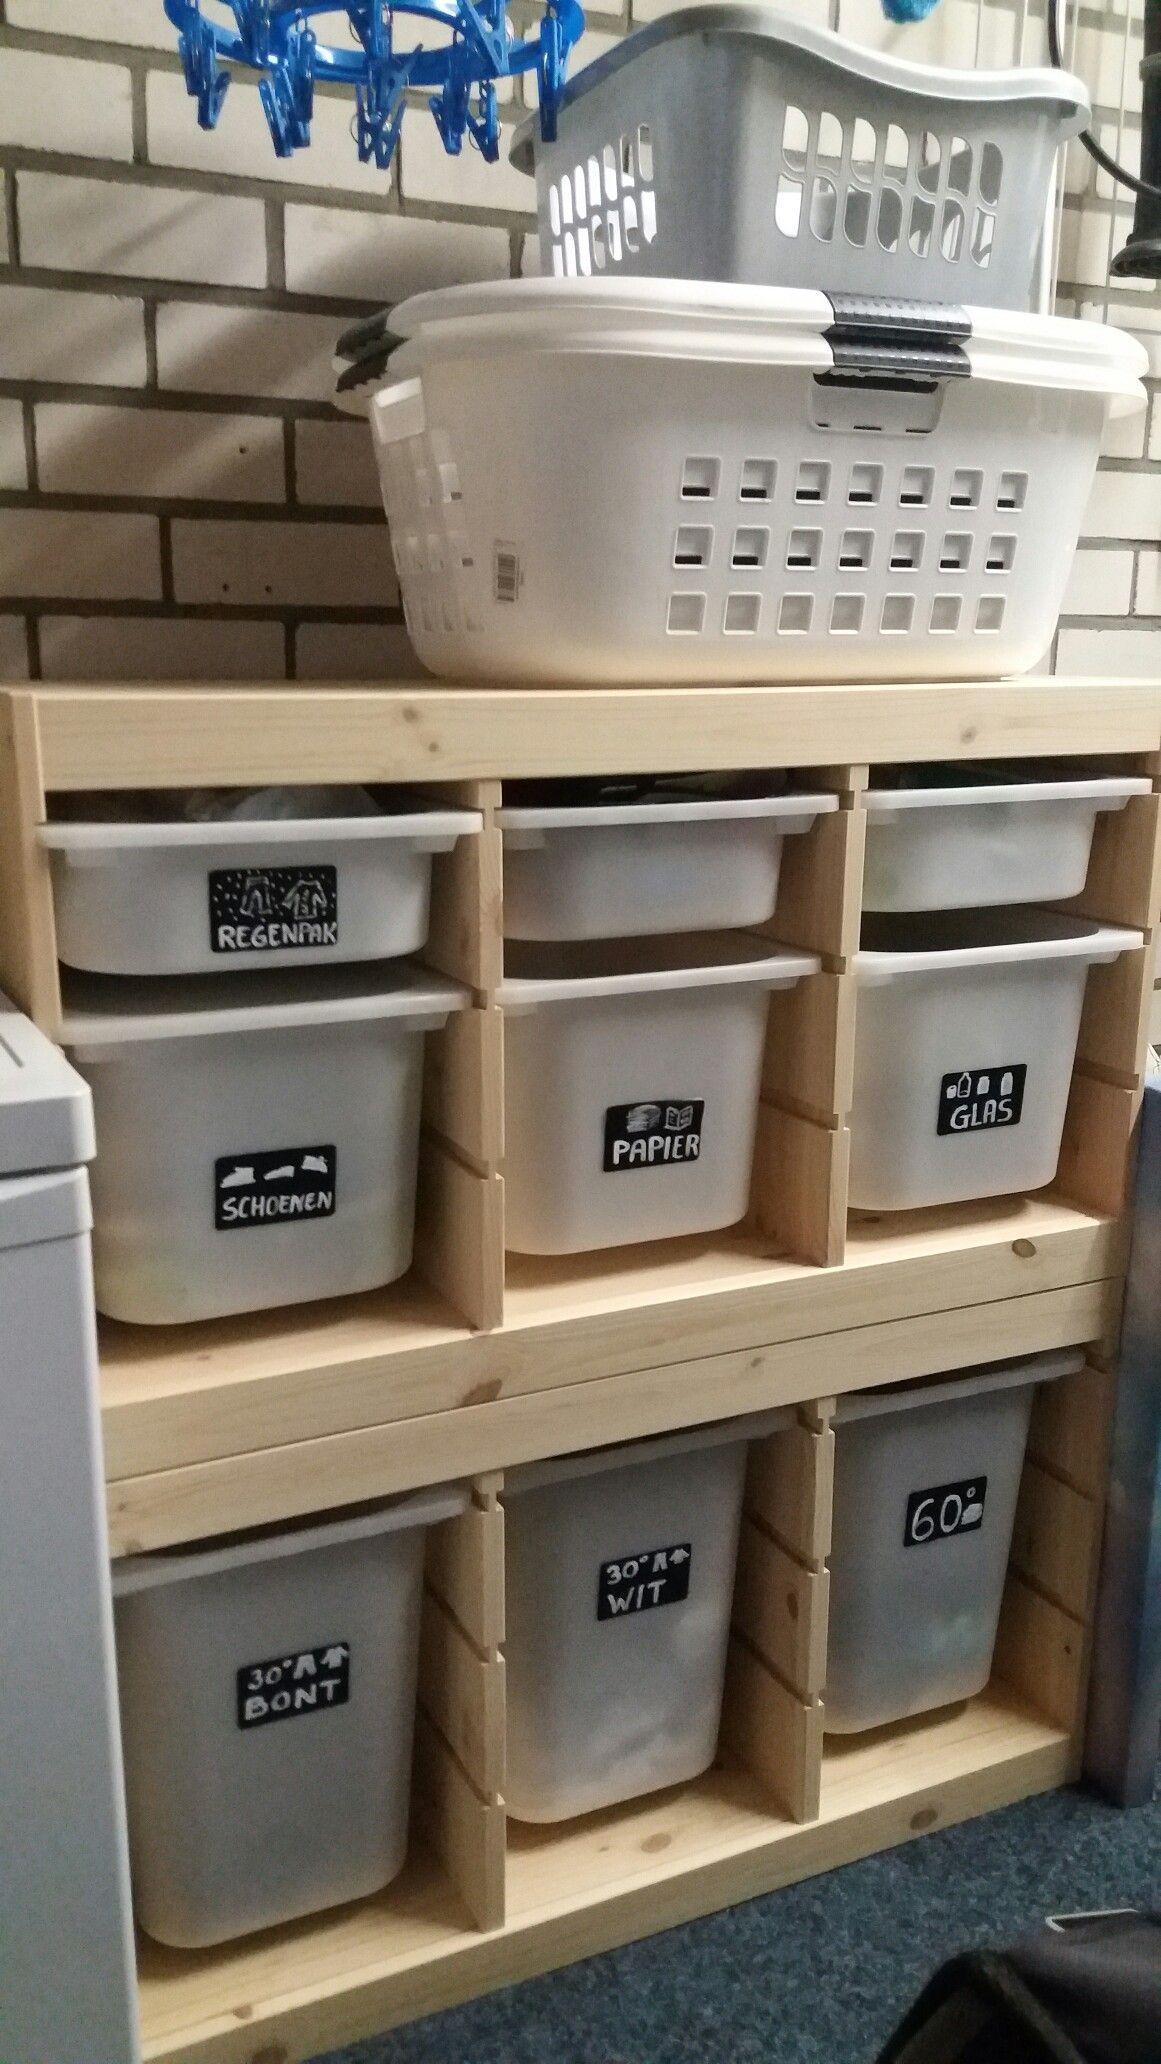 Bijkeuken Organiser Van Ikea Trofast Kast Hauswirtschaftsraum Diy Waschkuche Hauswirtschaftsraum Ideen